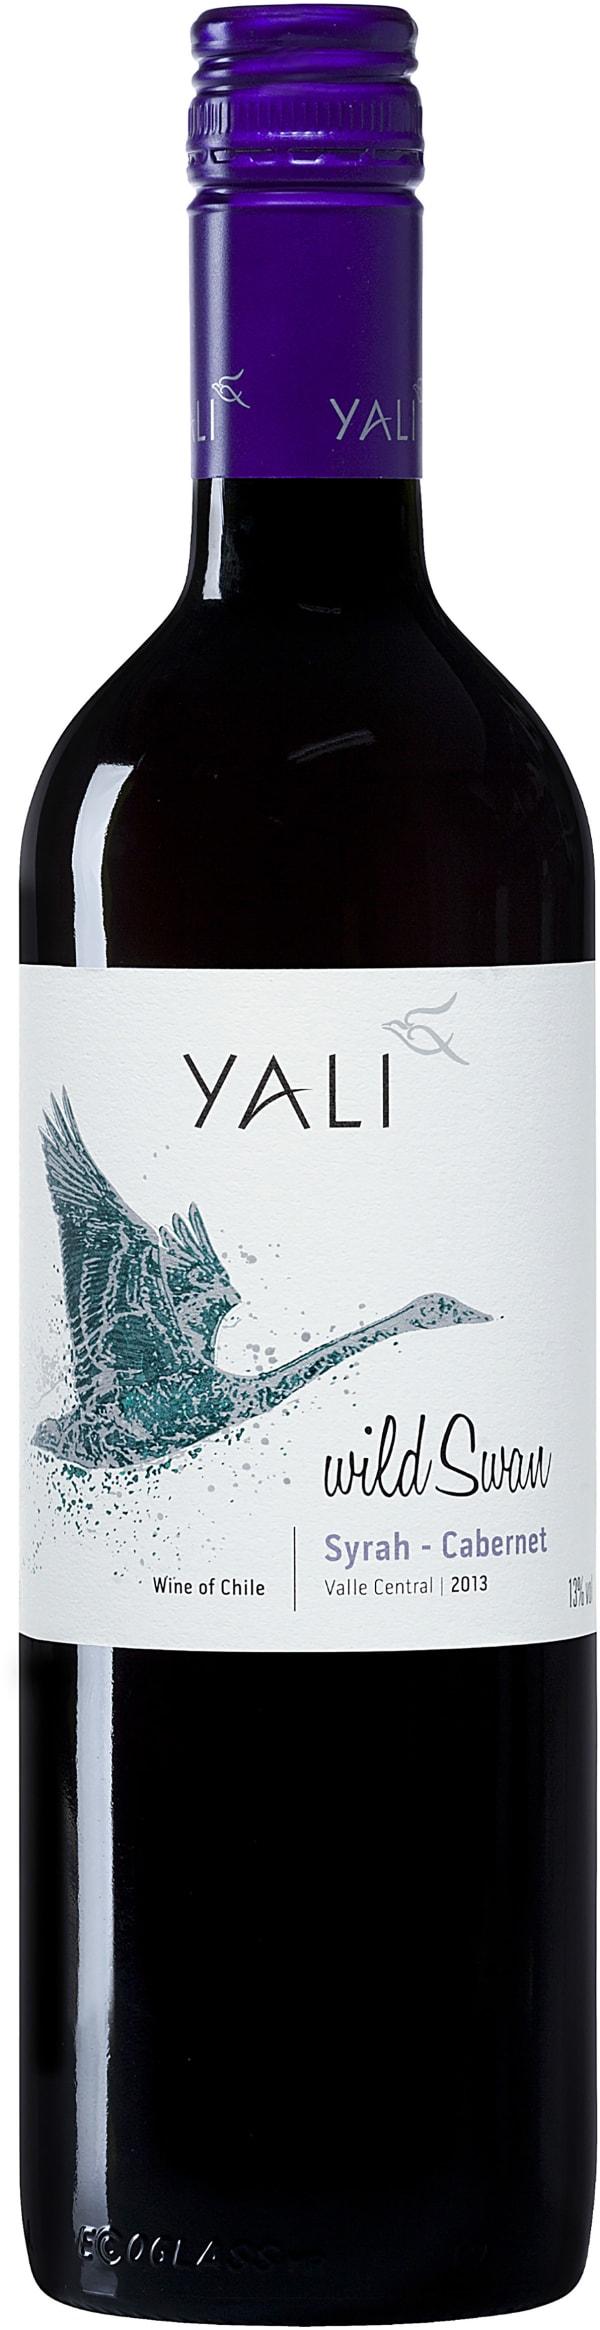 Yali Wild Swan Syrah Cabernet 2016